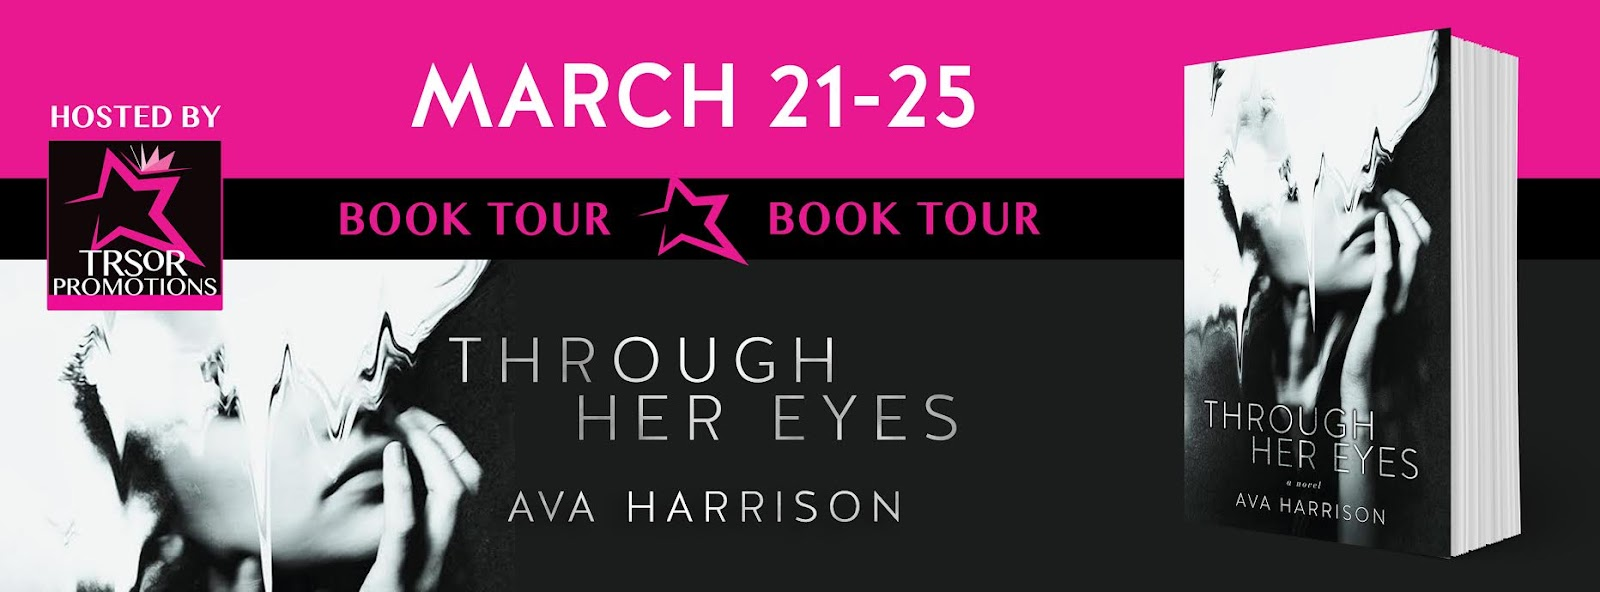 through her eyes book tour.jpg